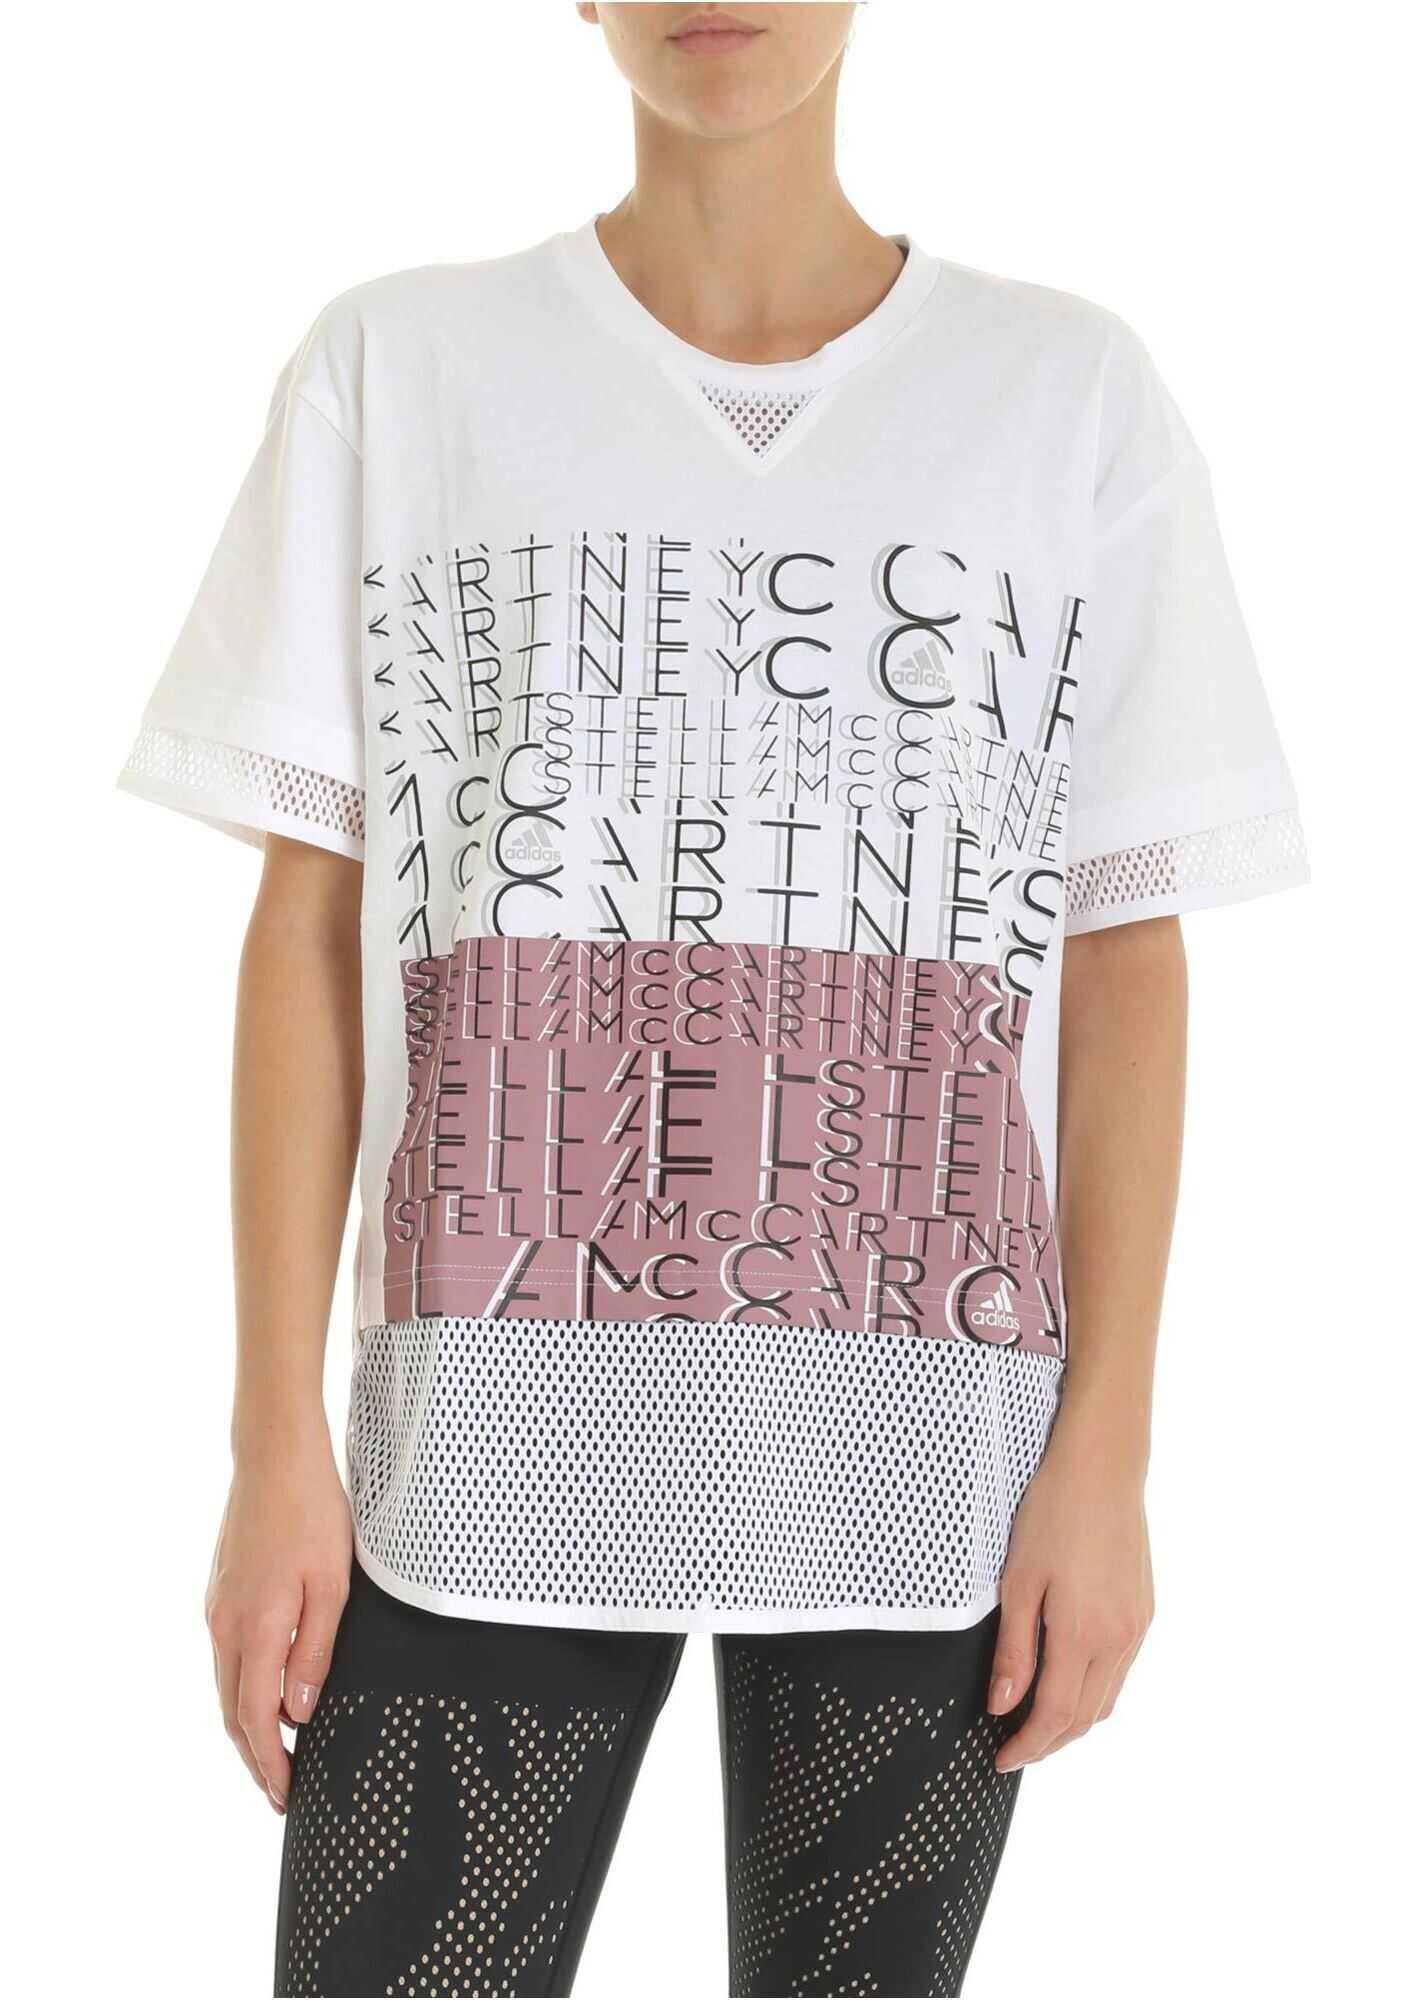 adidas by Stella McCartney Logo Tee T-Shirt In White White